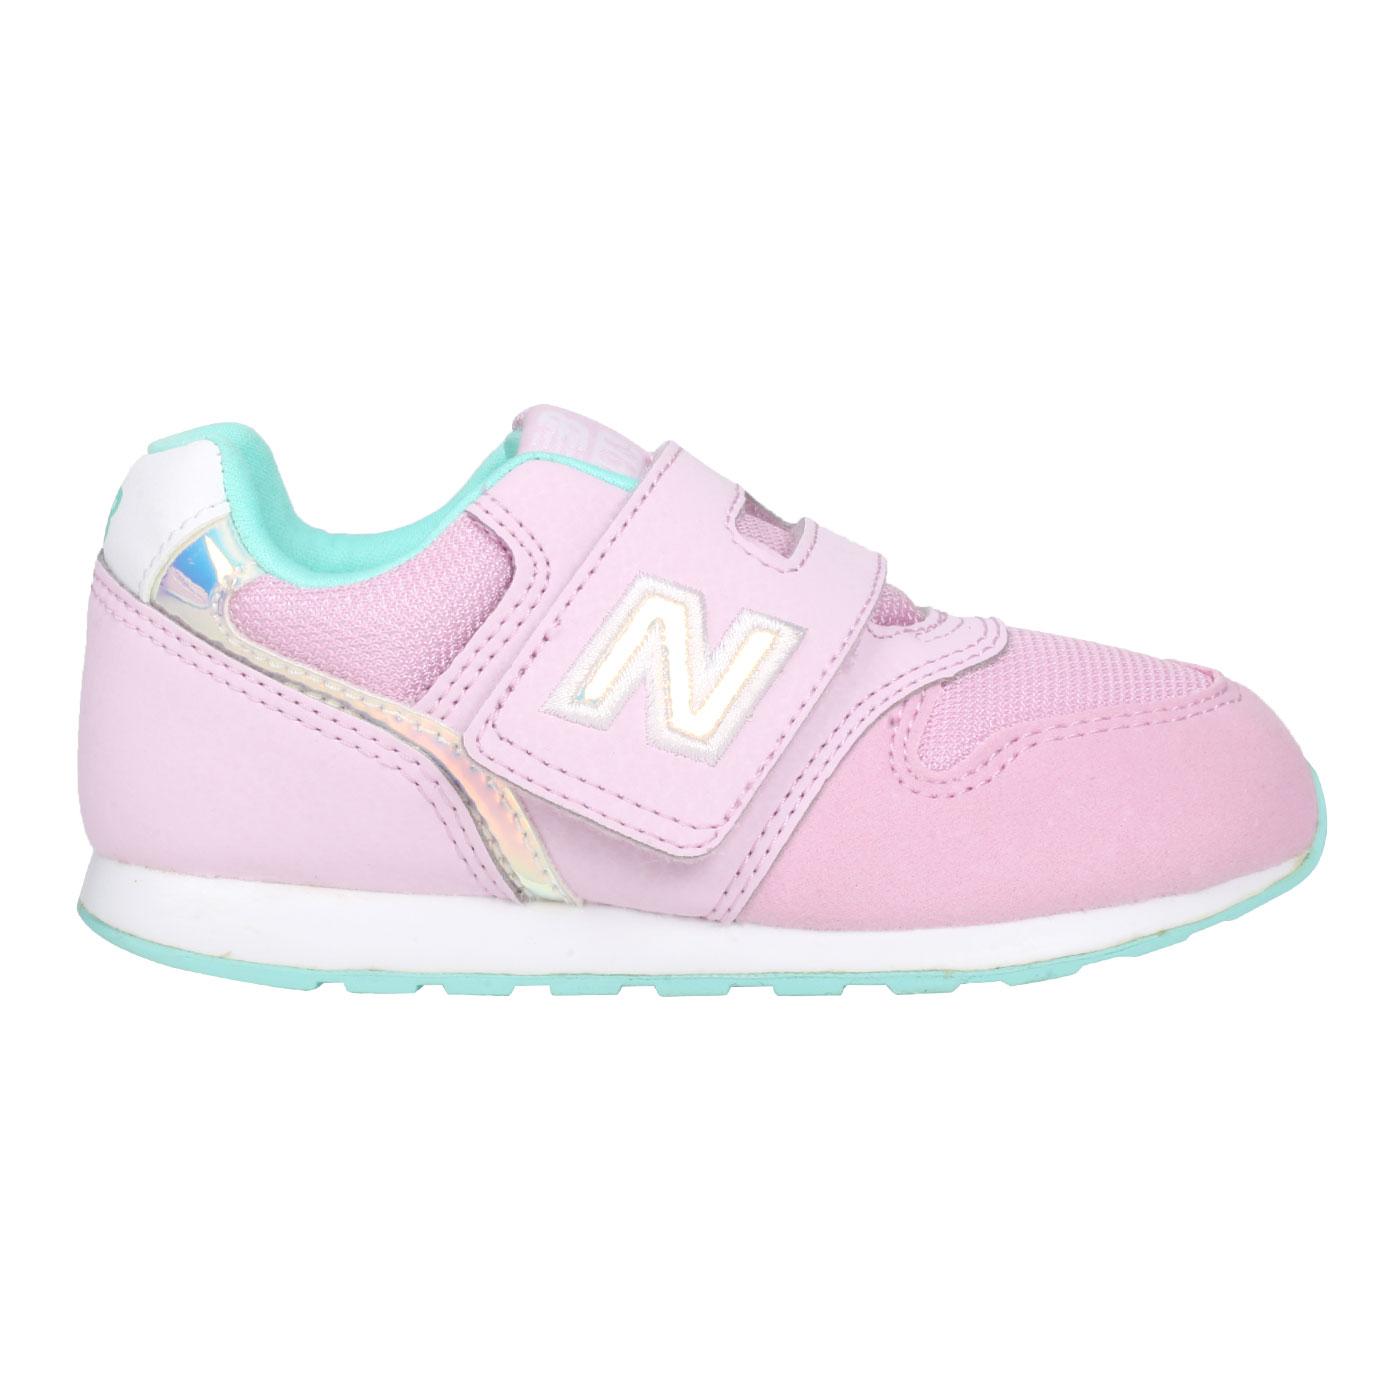 NEW BALANCE 小童運動休閒鞋-WIDE IZ996HPN - 粉紅湖水藍